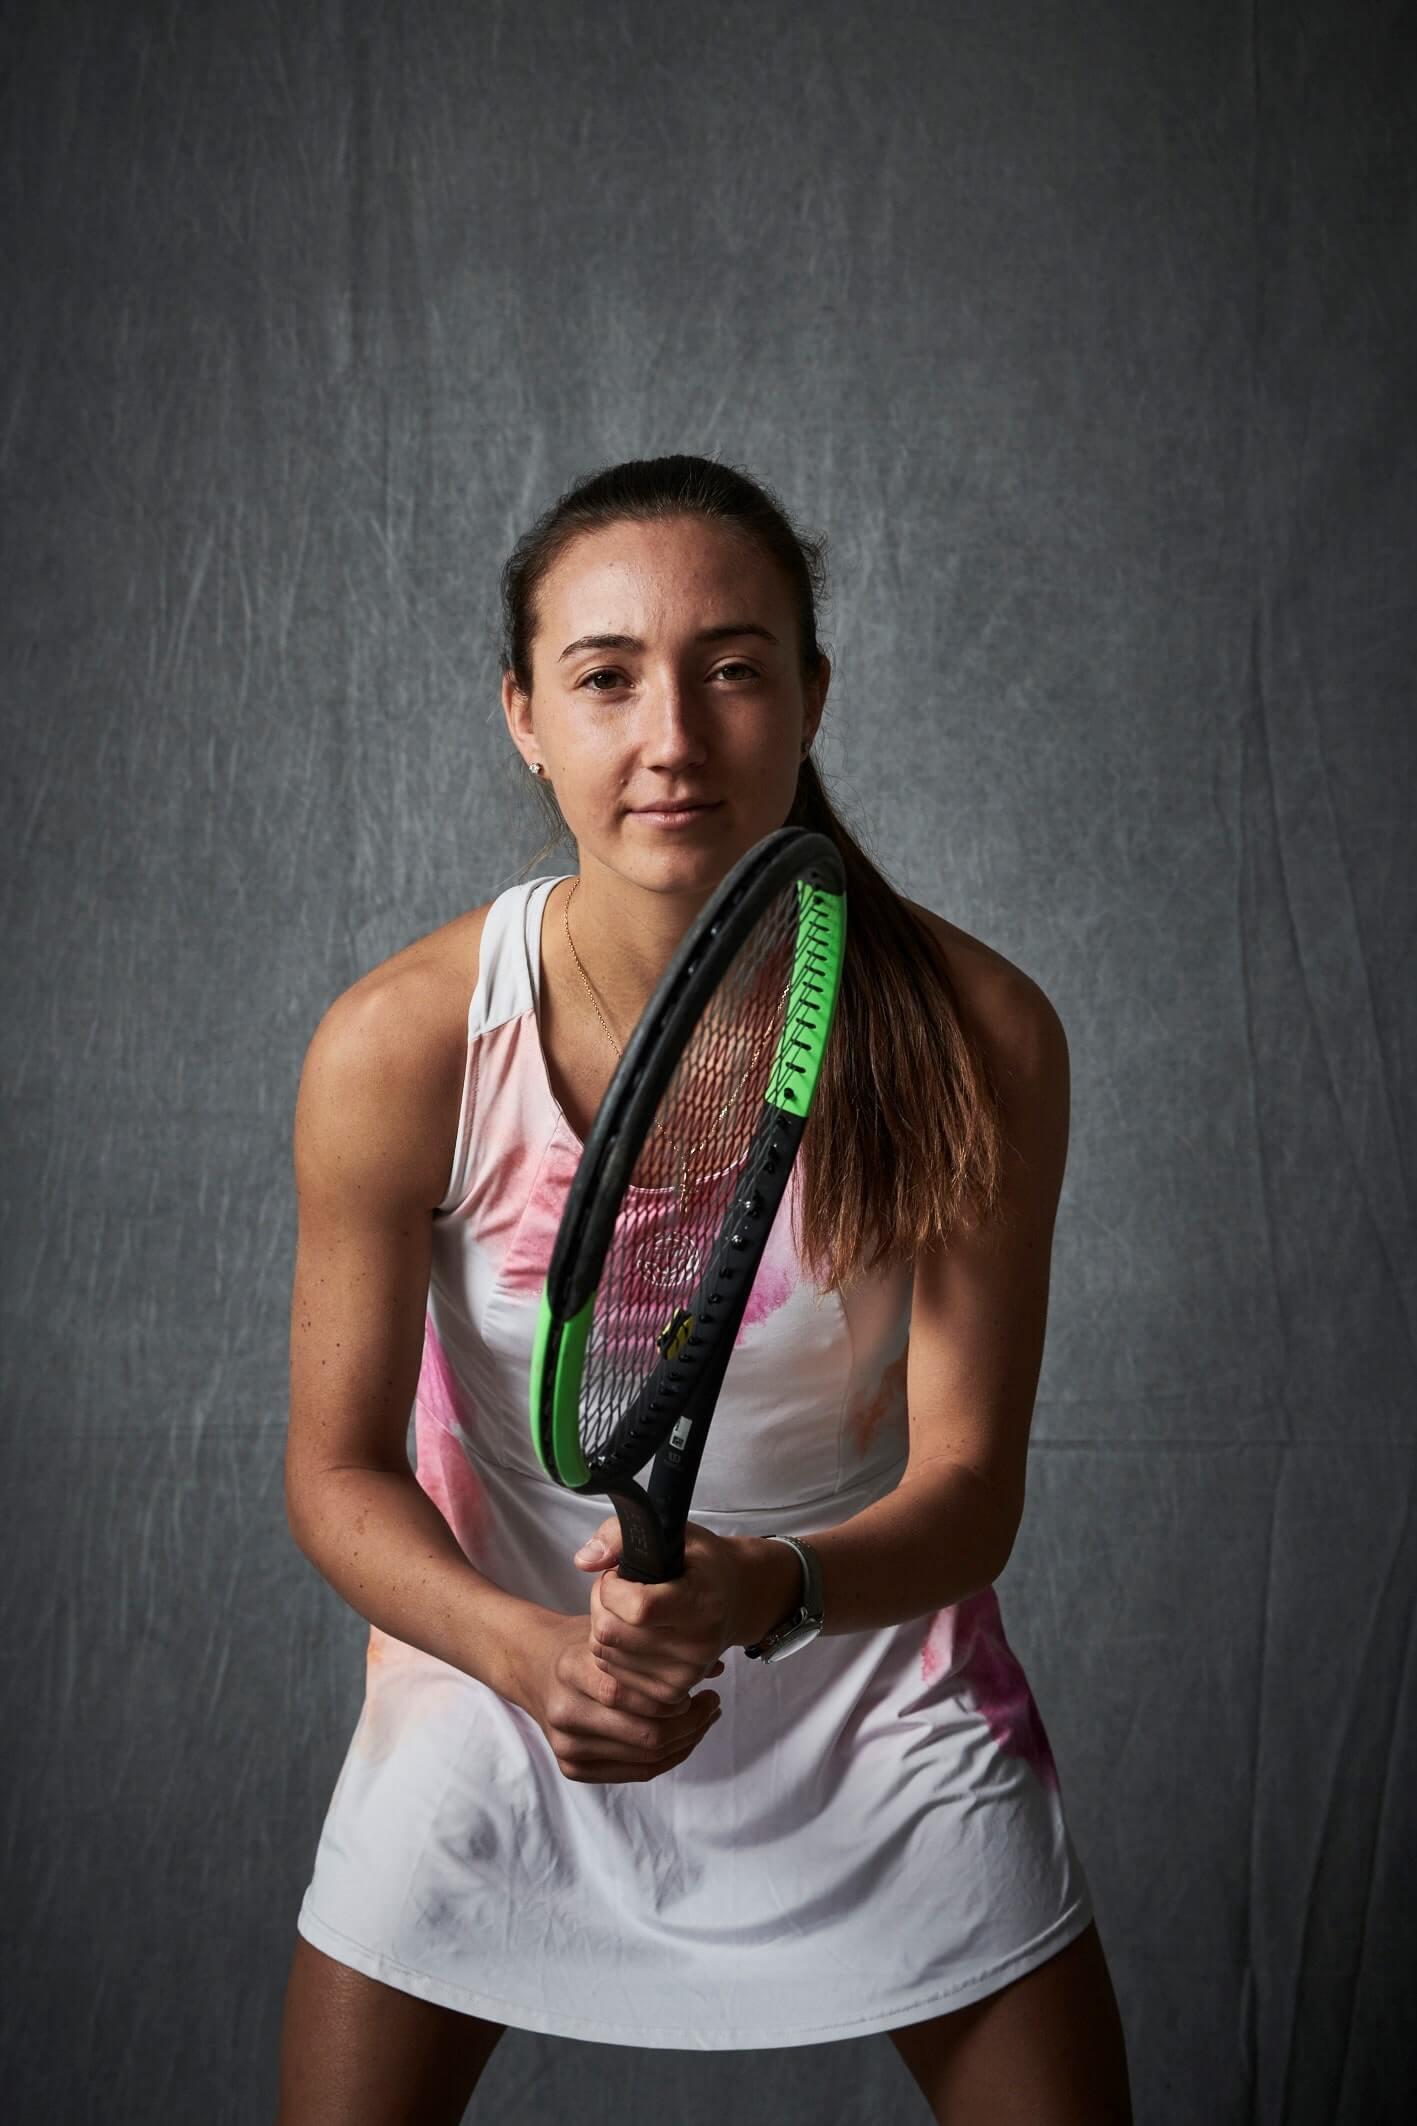 Leonie Küng, Tennis